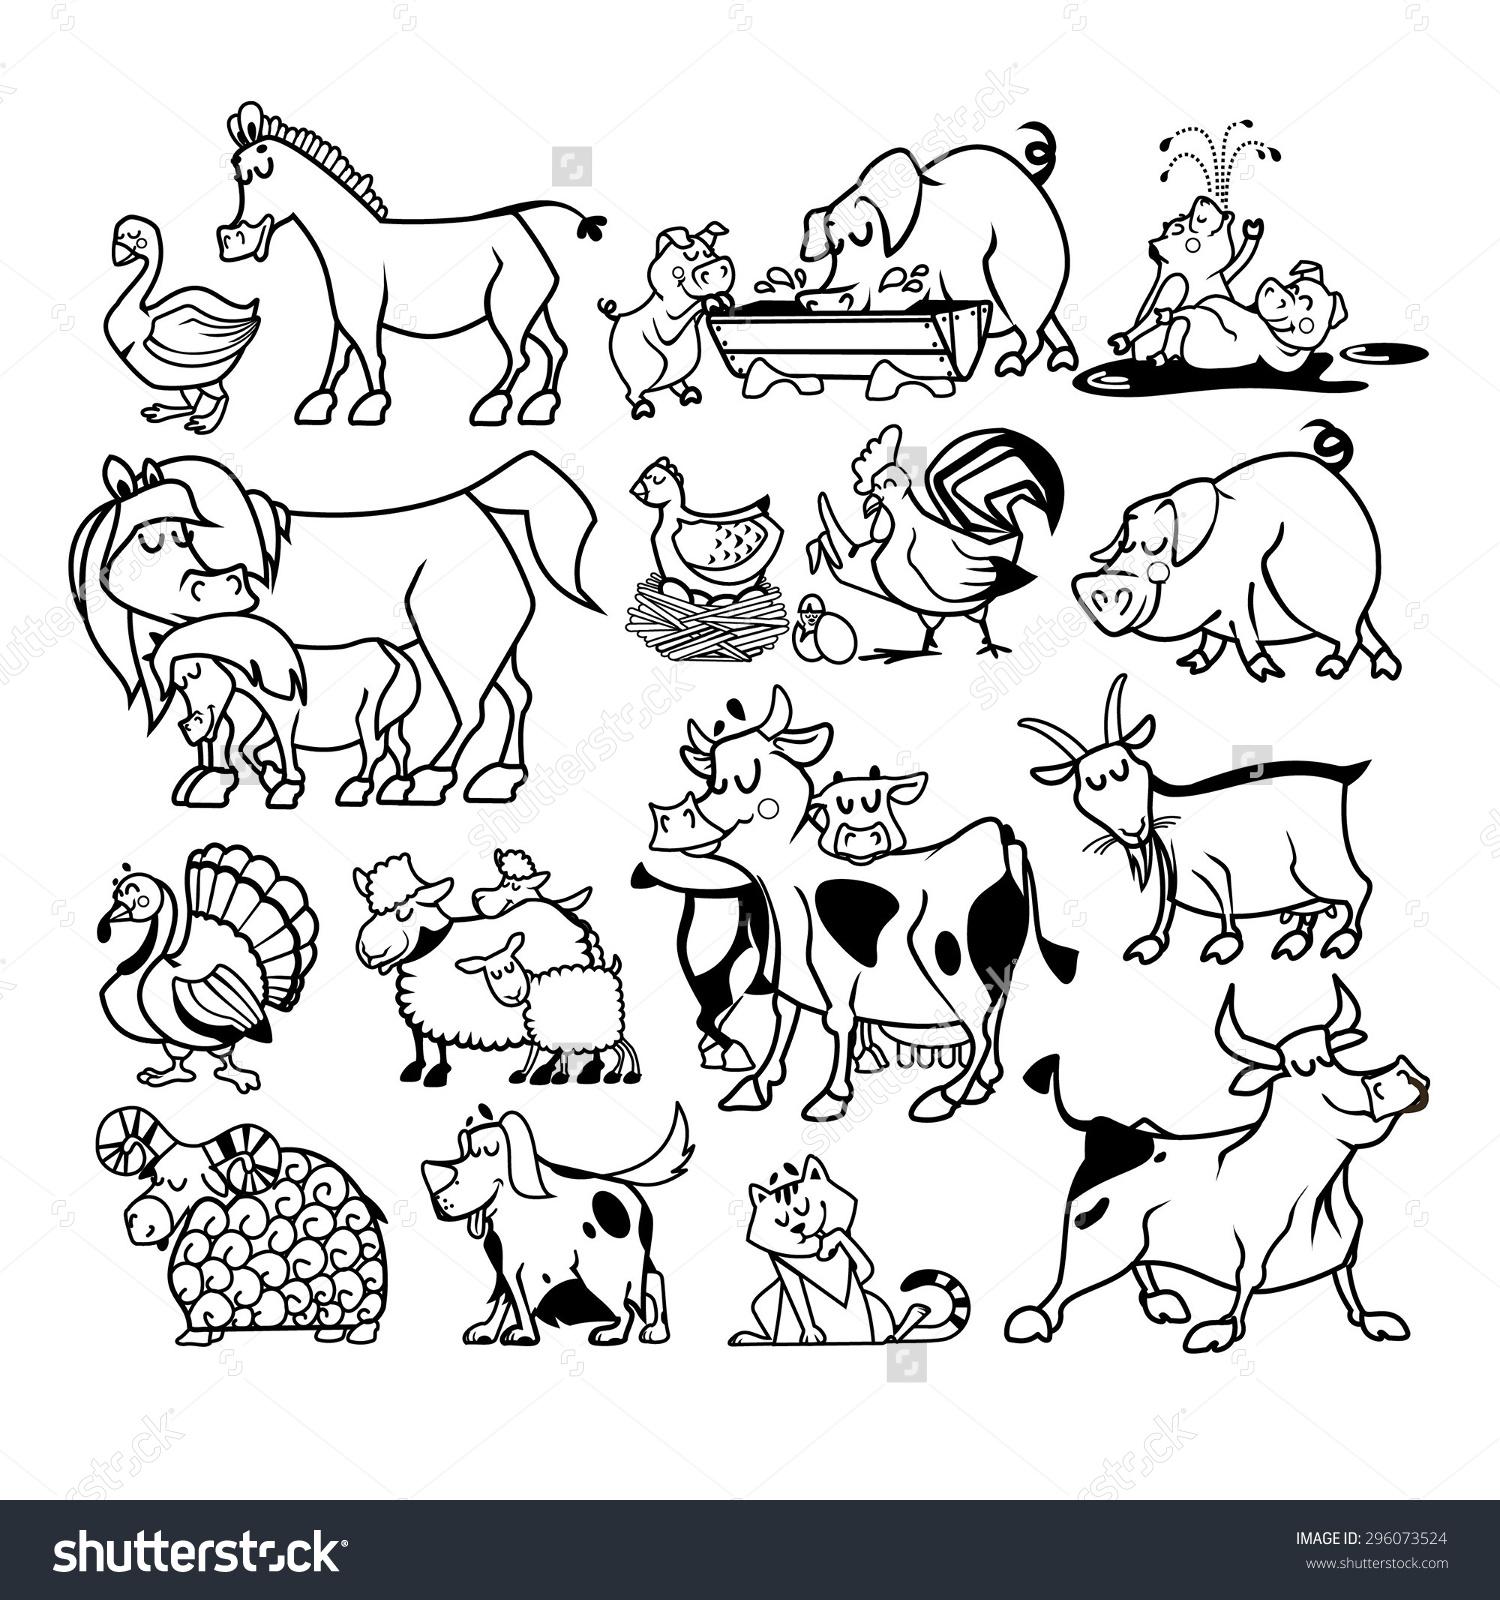 Amd clipart farm animal And Farm Animals black Set